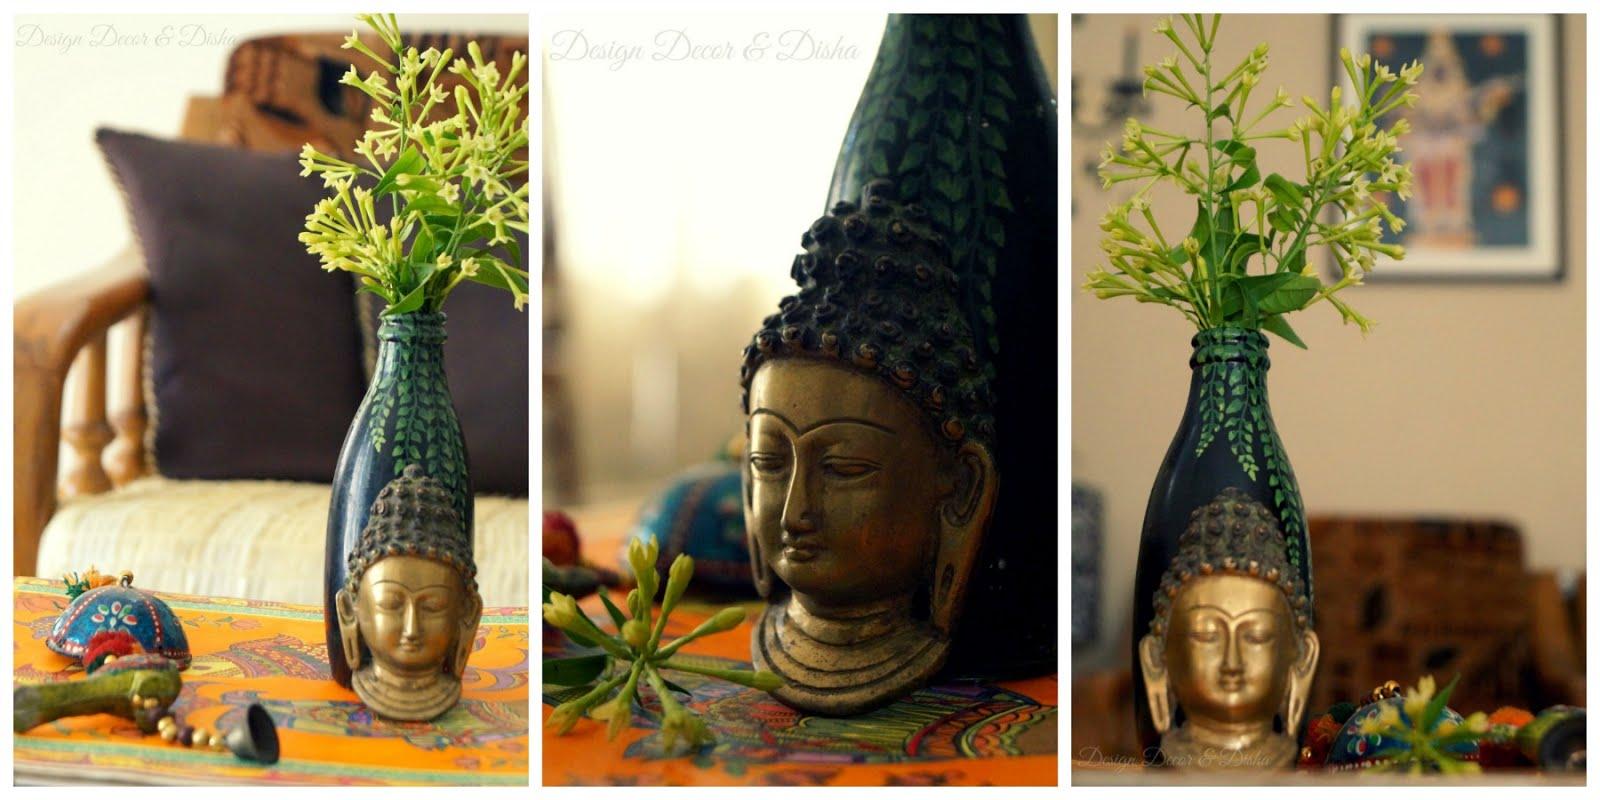 design decor u0026 disha buddha decor ideas